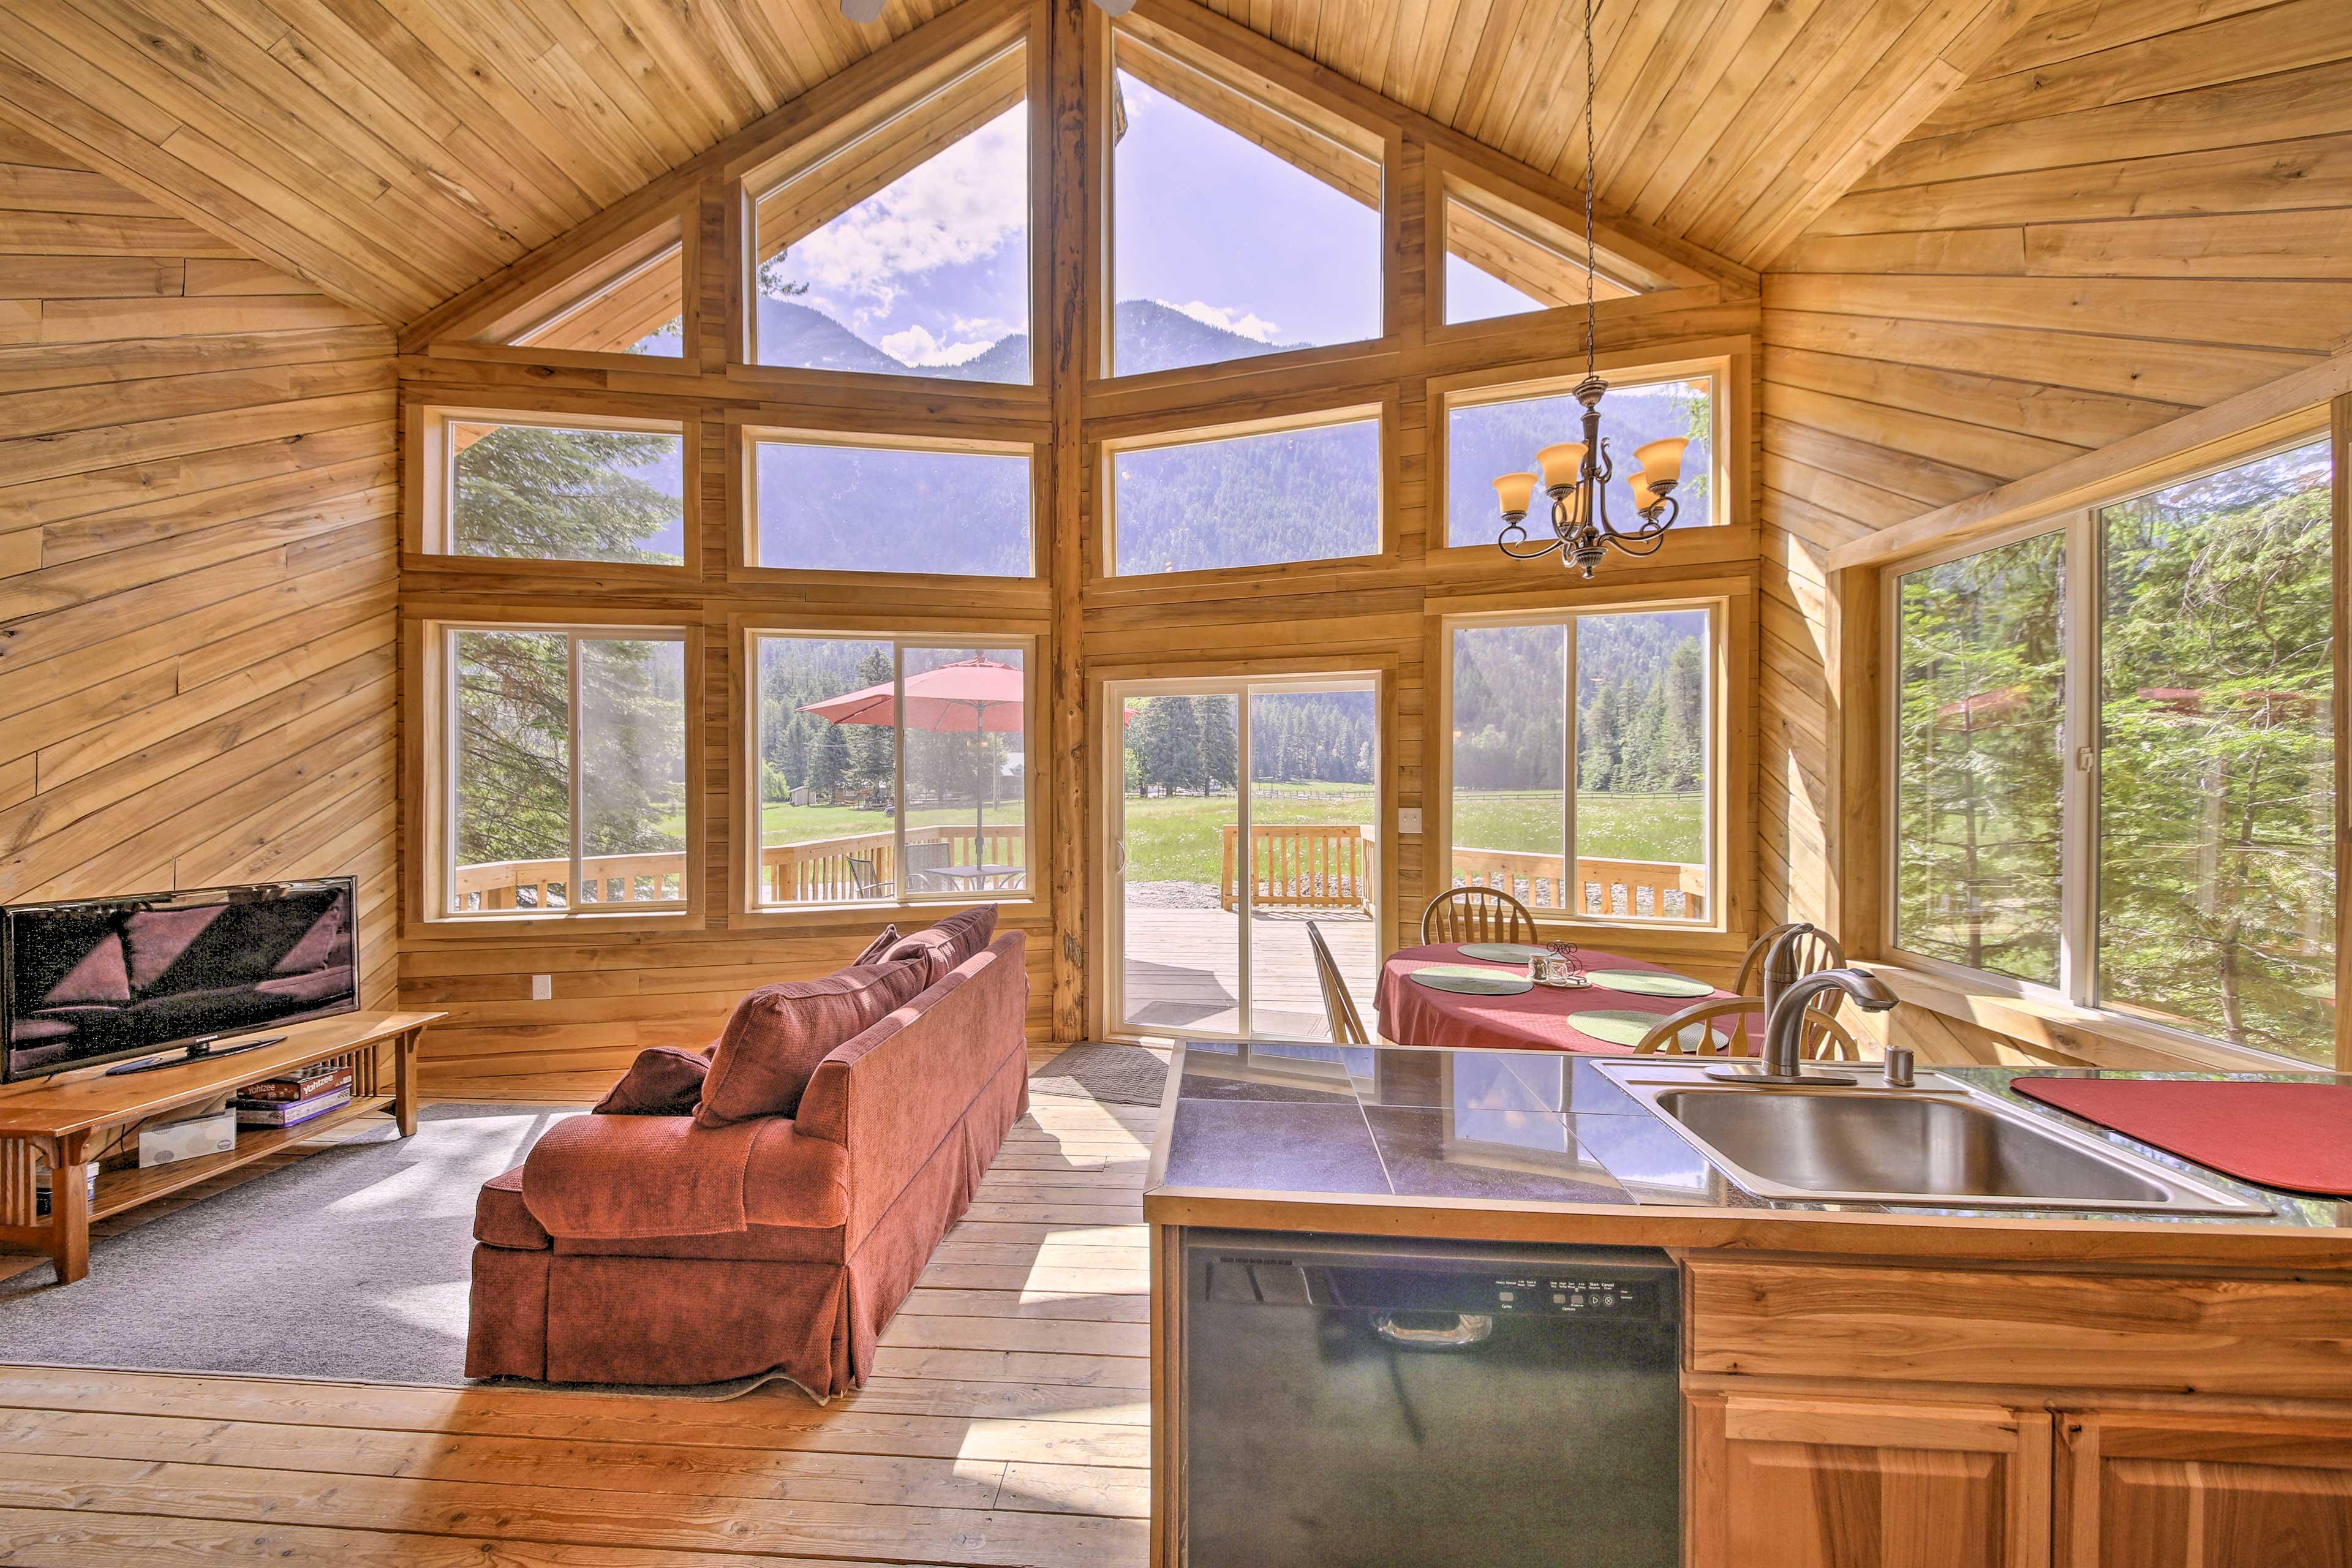 Stunning views await through floor-to-ceiling windows.